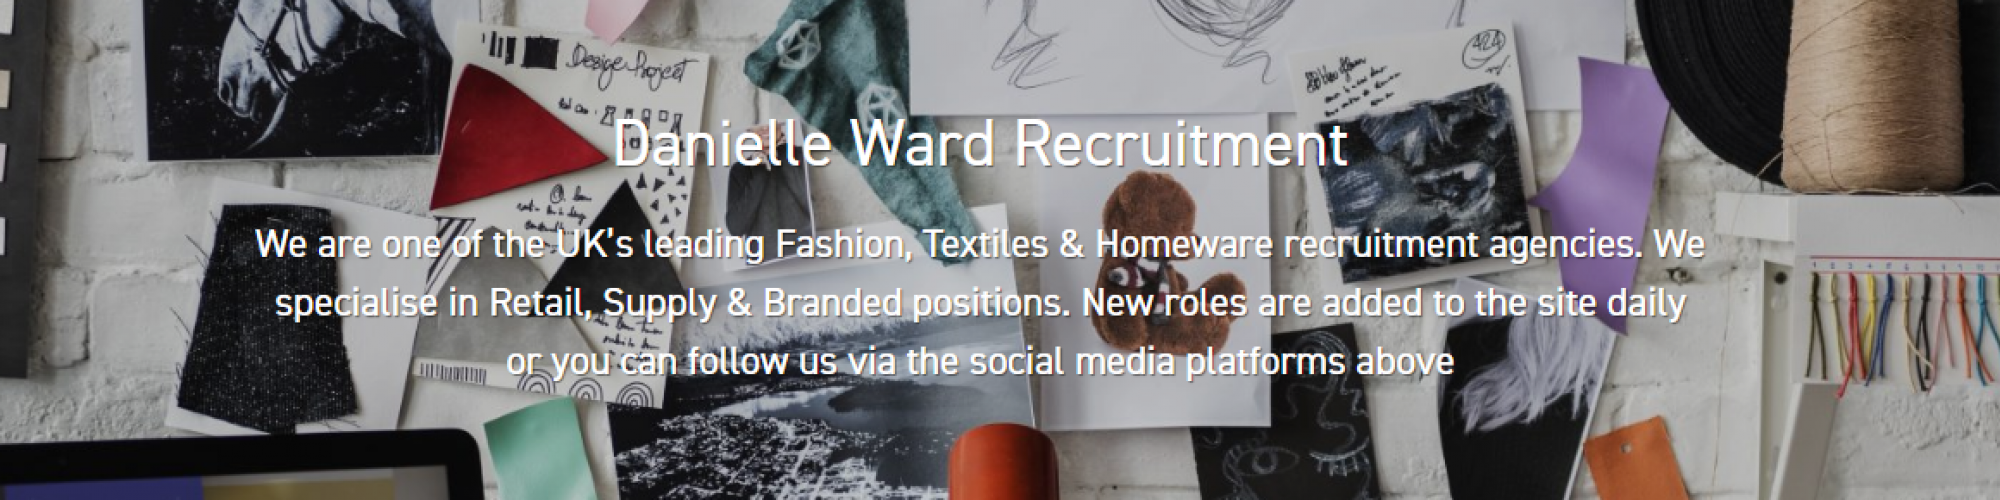 Danielle Ward Recruitment Ltd